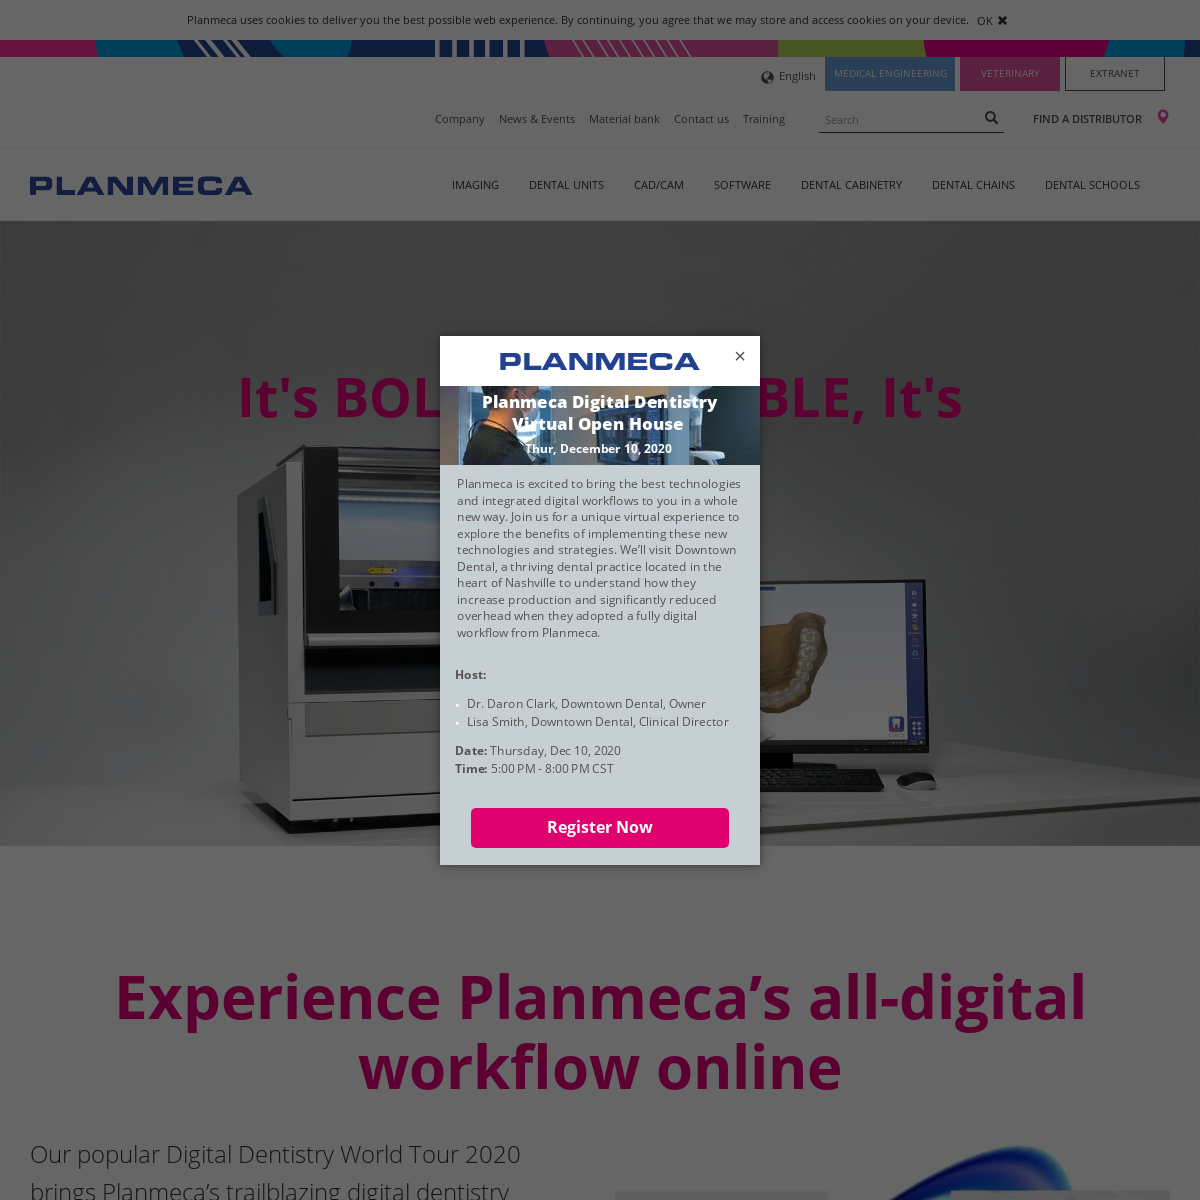 Planmeca – Better care through innovation